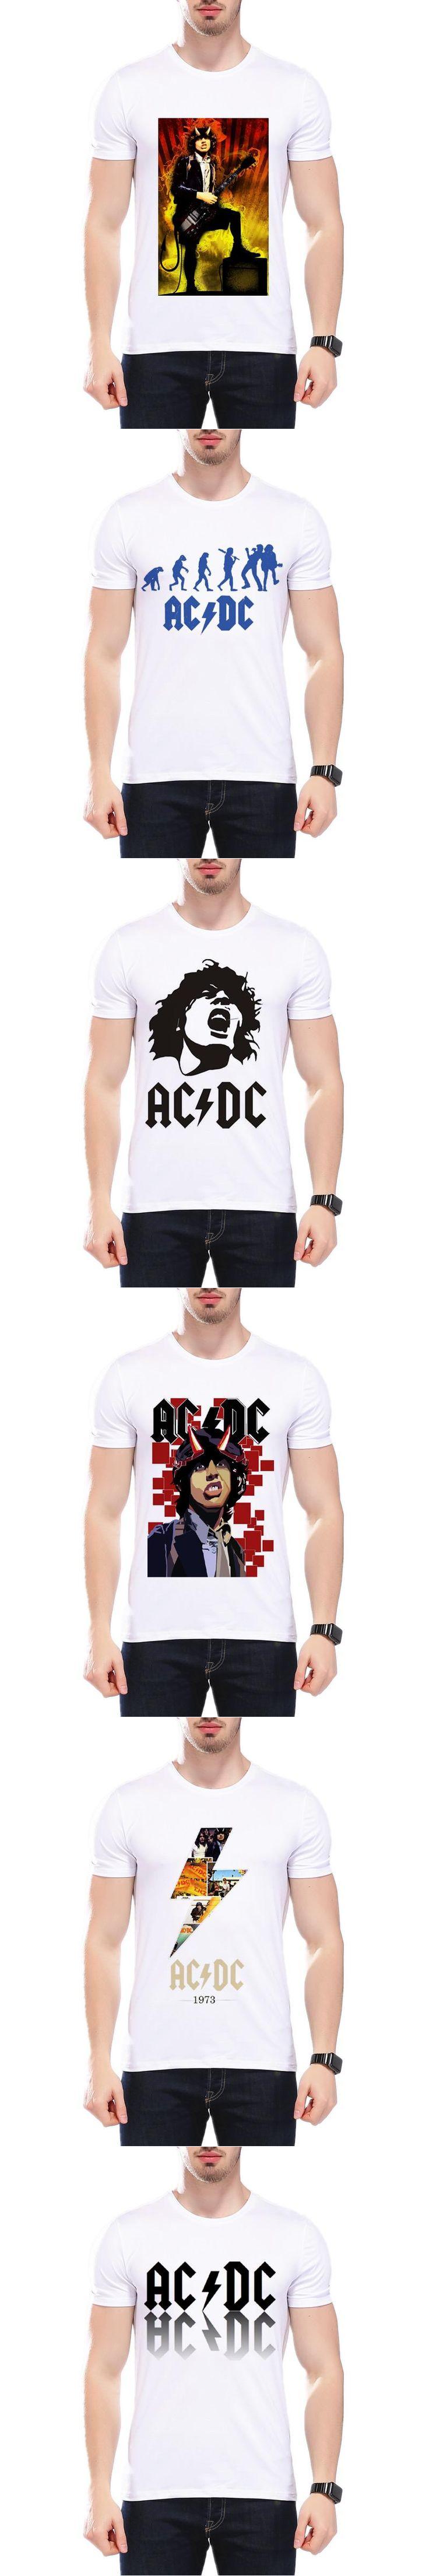 New Camisetas AC/DC band rock T Shirt Fashion ACDC The Beatles Nirvana Band Logo Casual Brand Men T Shirt L9O5